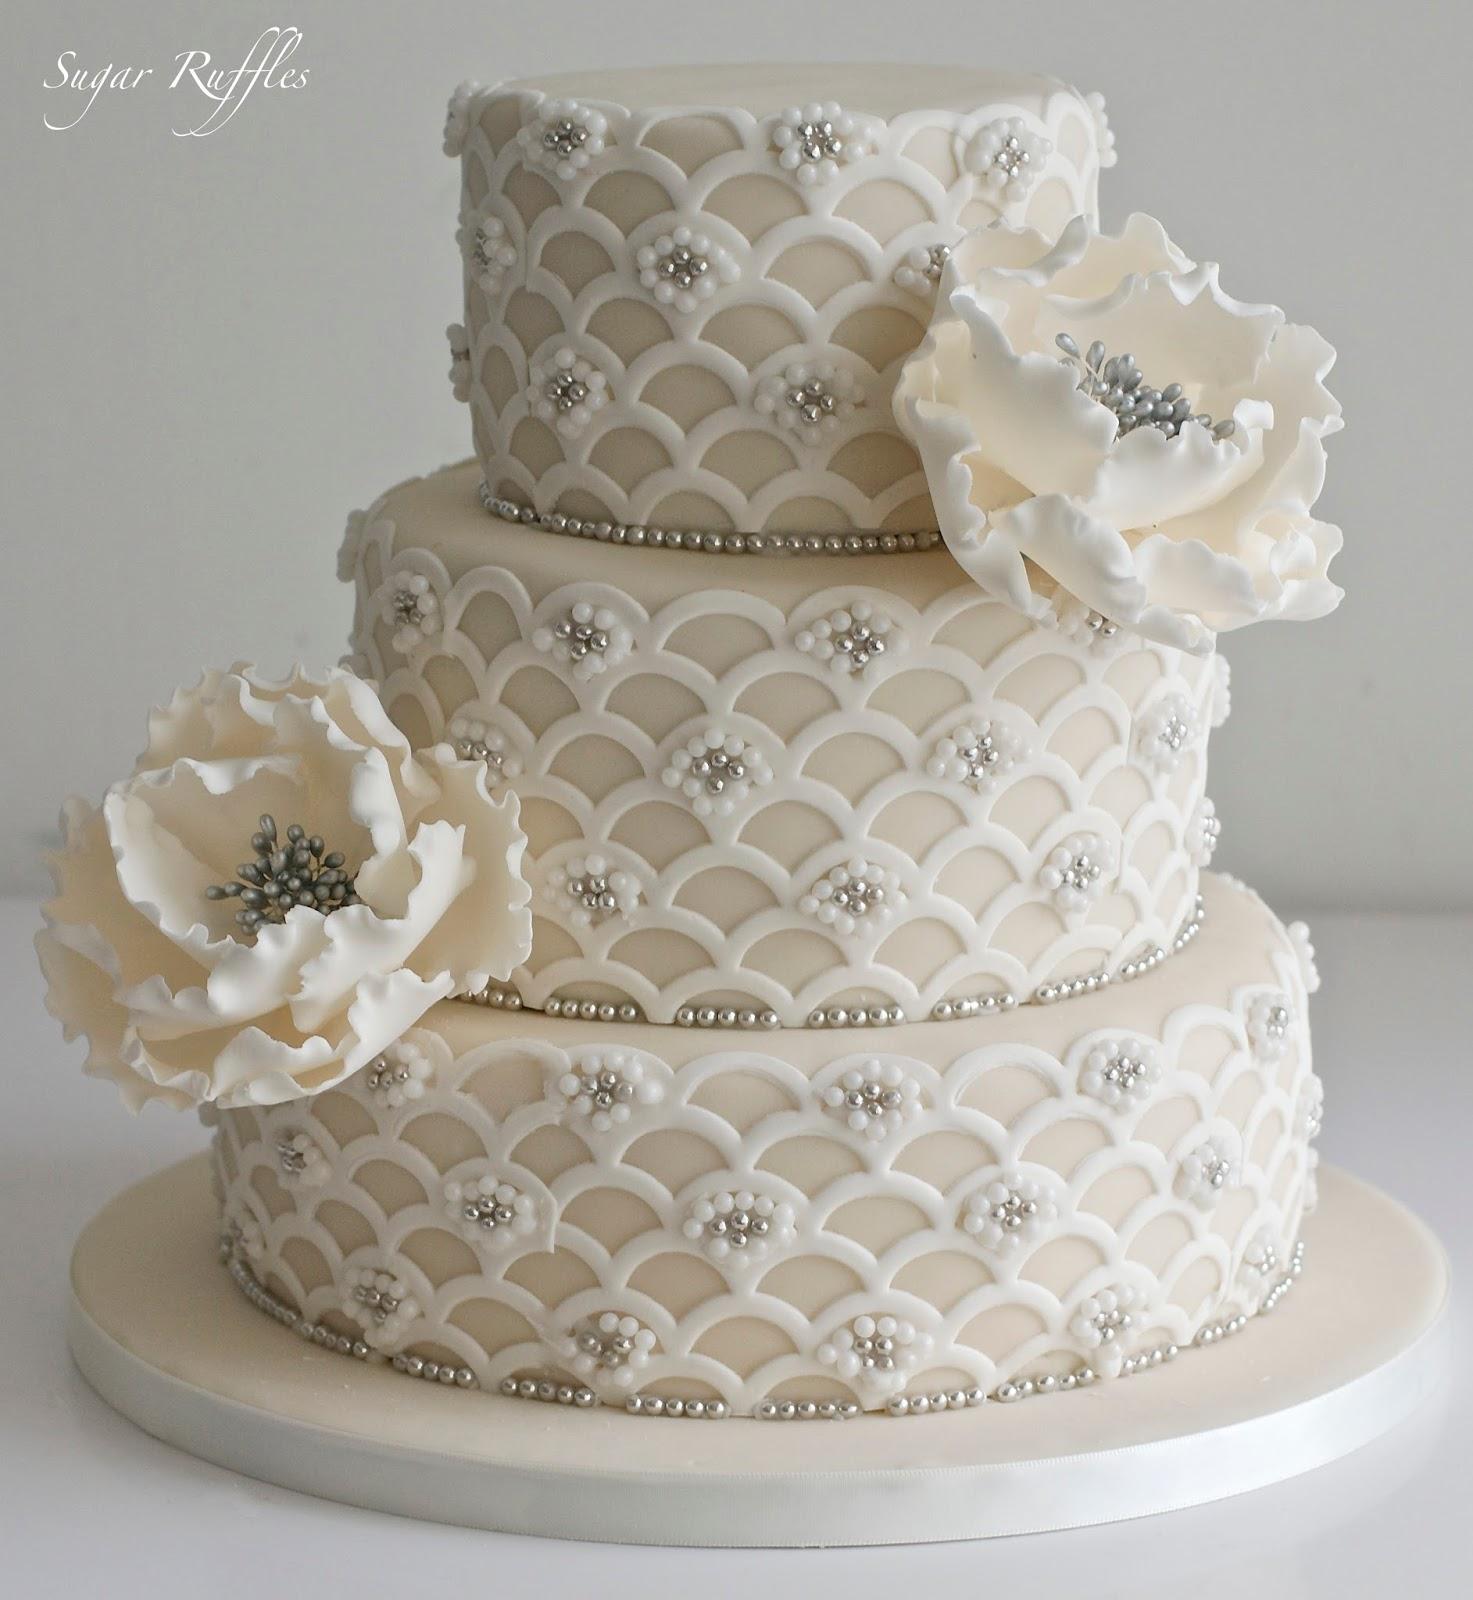 3 Tier Wedding Cakes 15 Stunning A tier wedding cake